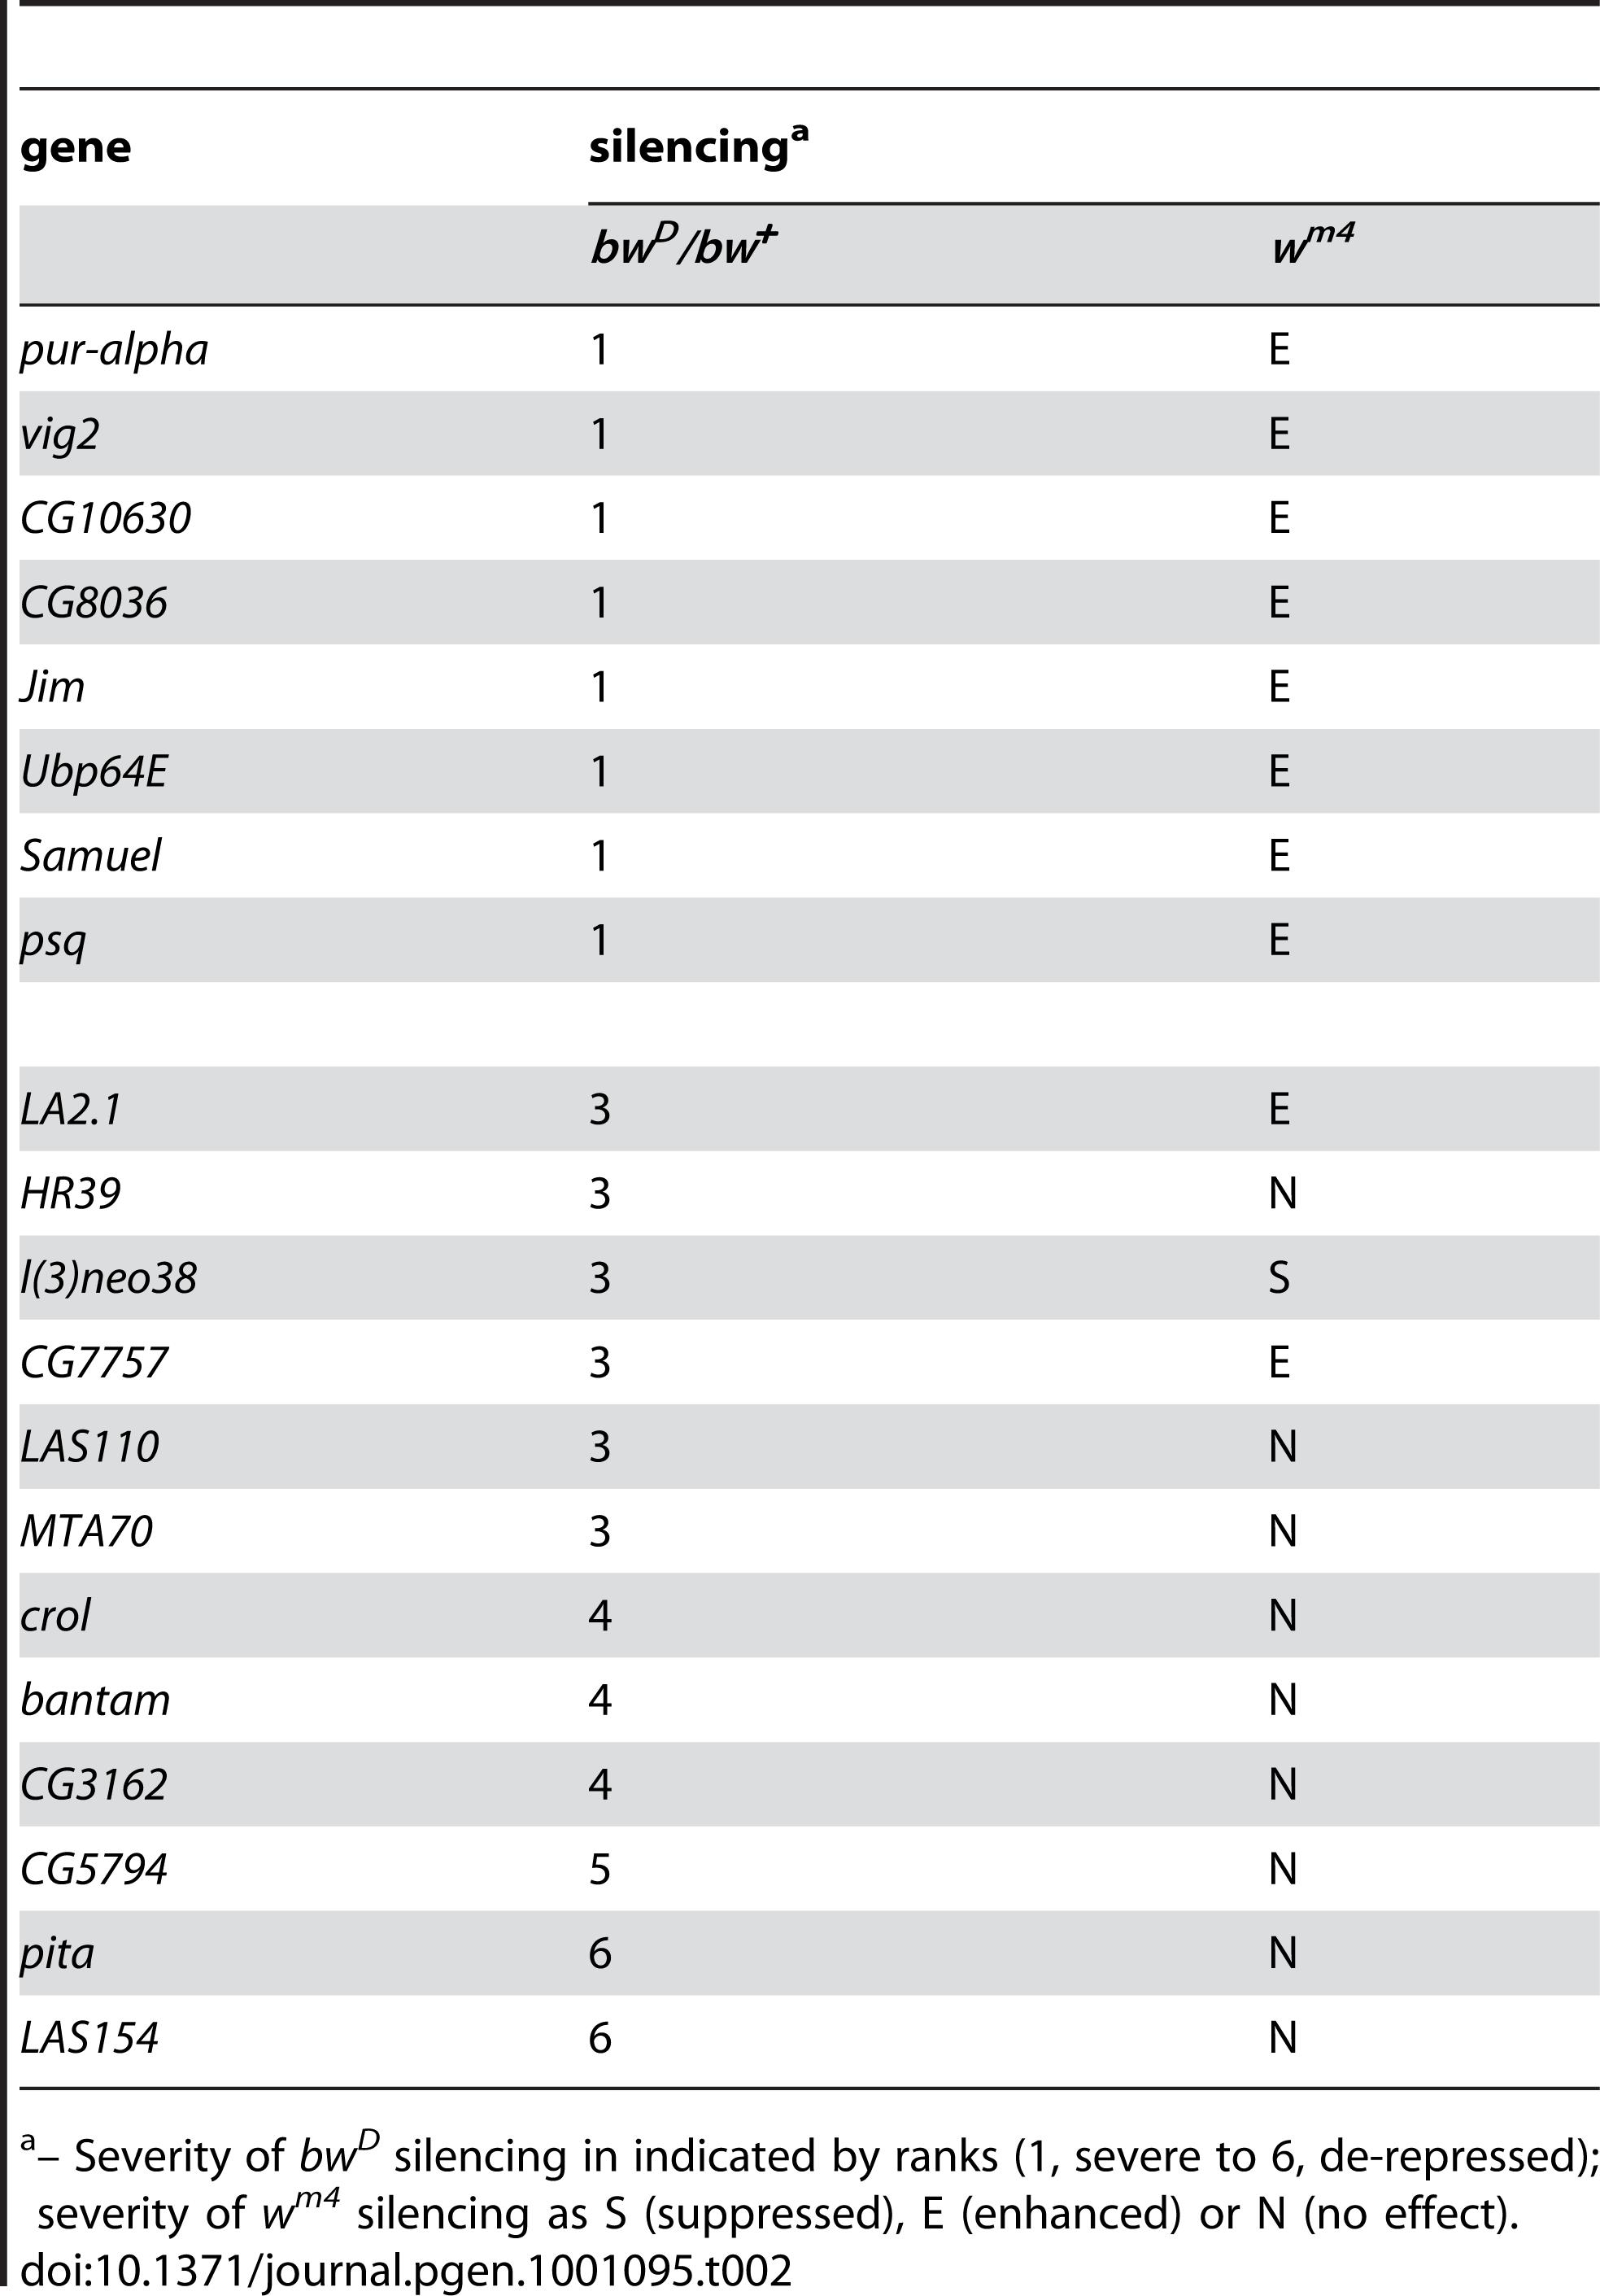 Specificity of modifiers for heterochromatic rearrangements.